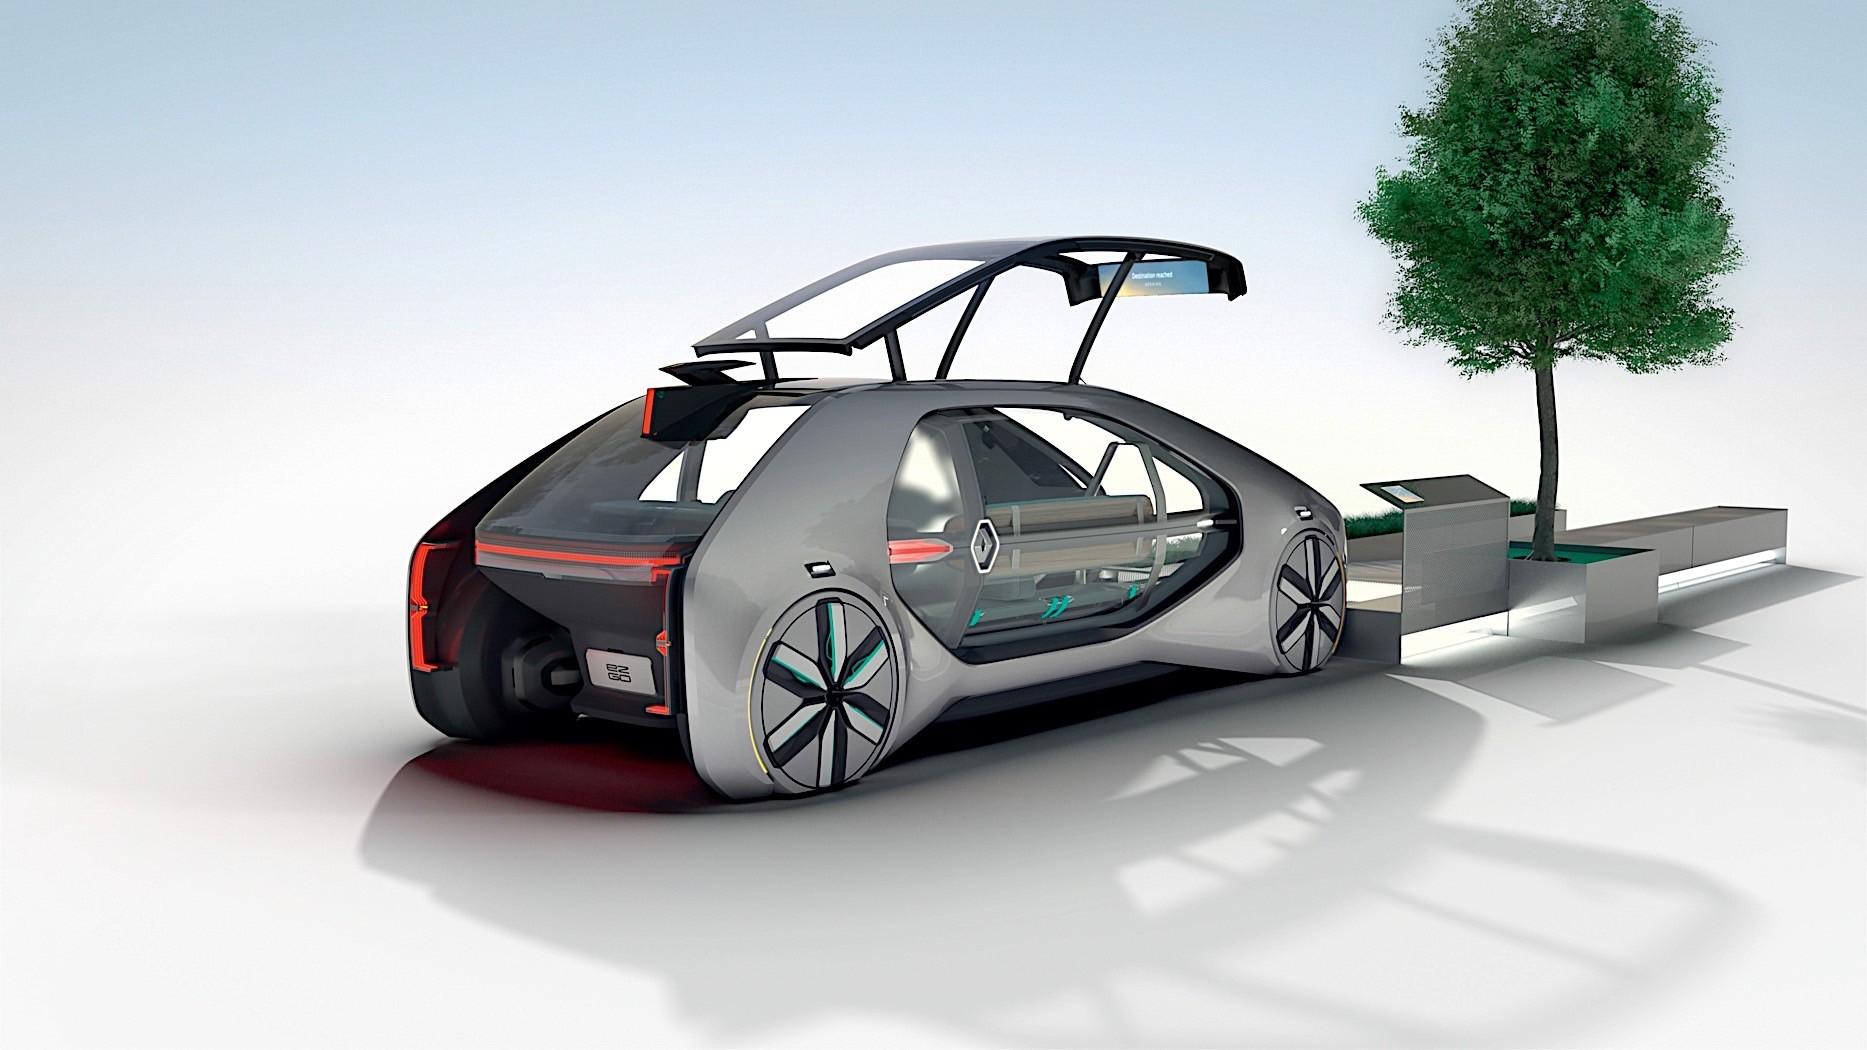 renault ez go living room on wheels unveiled in geneva autoevolution. Black Bedroom Furniture Sets. Home Design Ideas